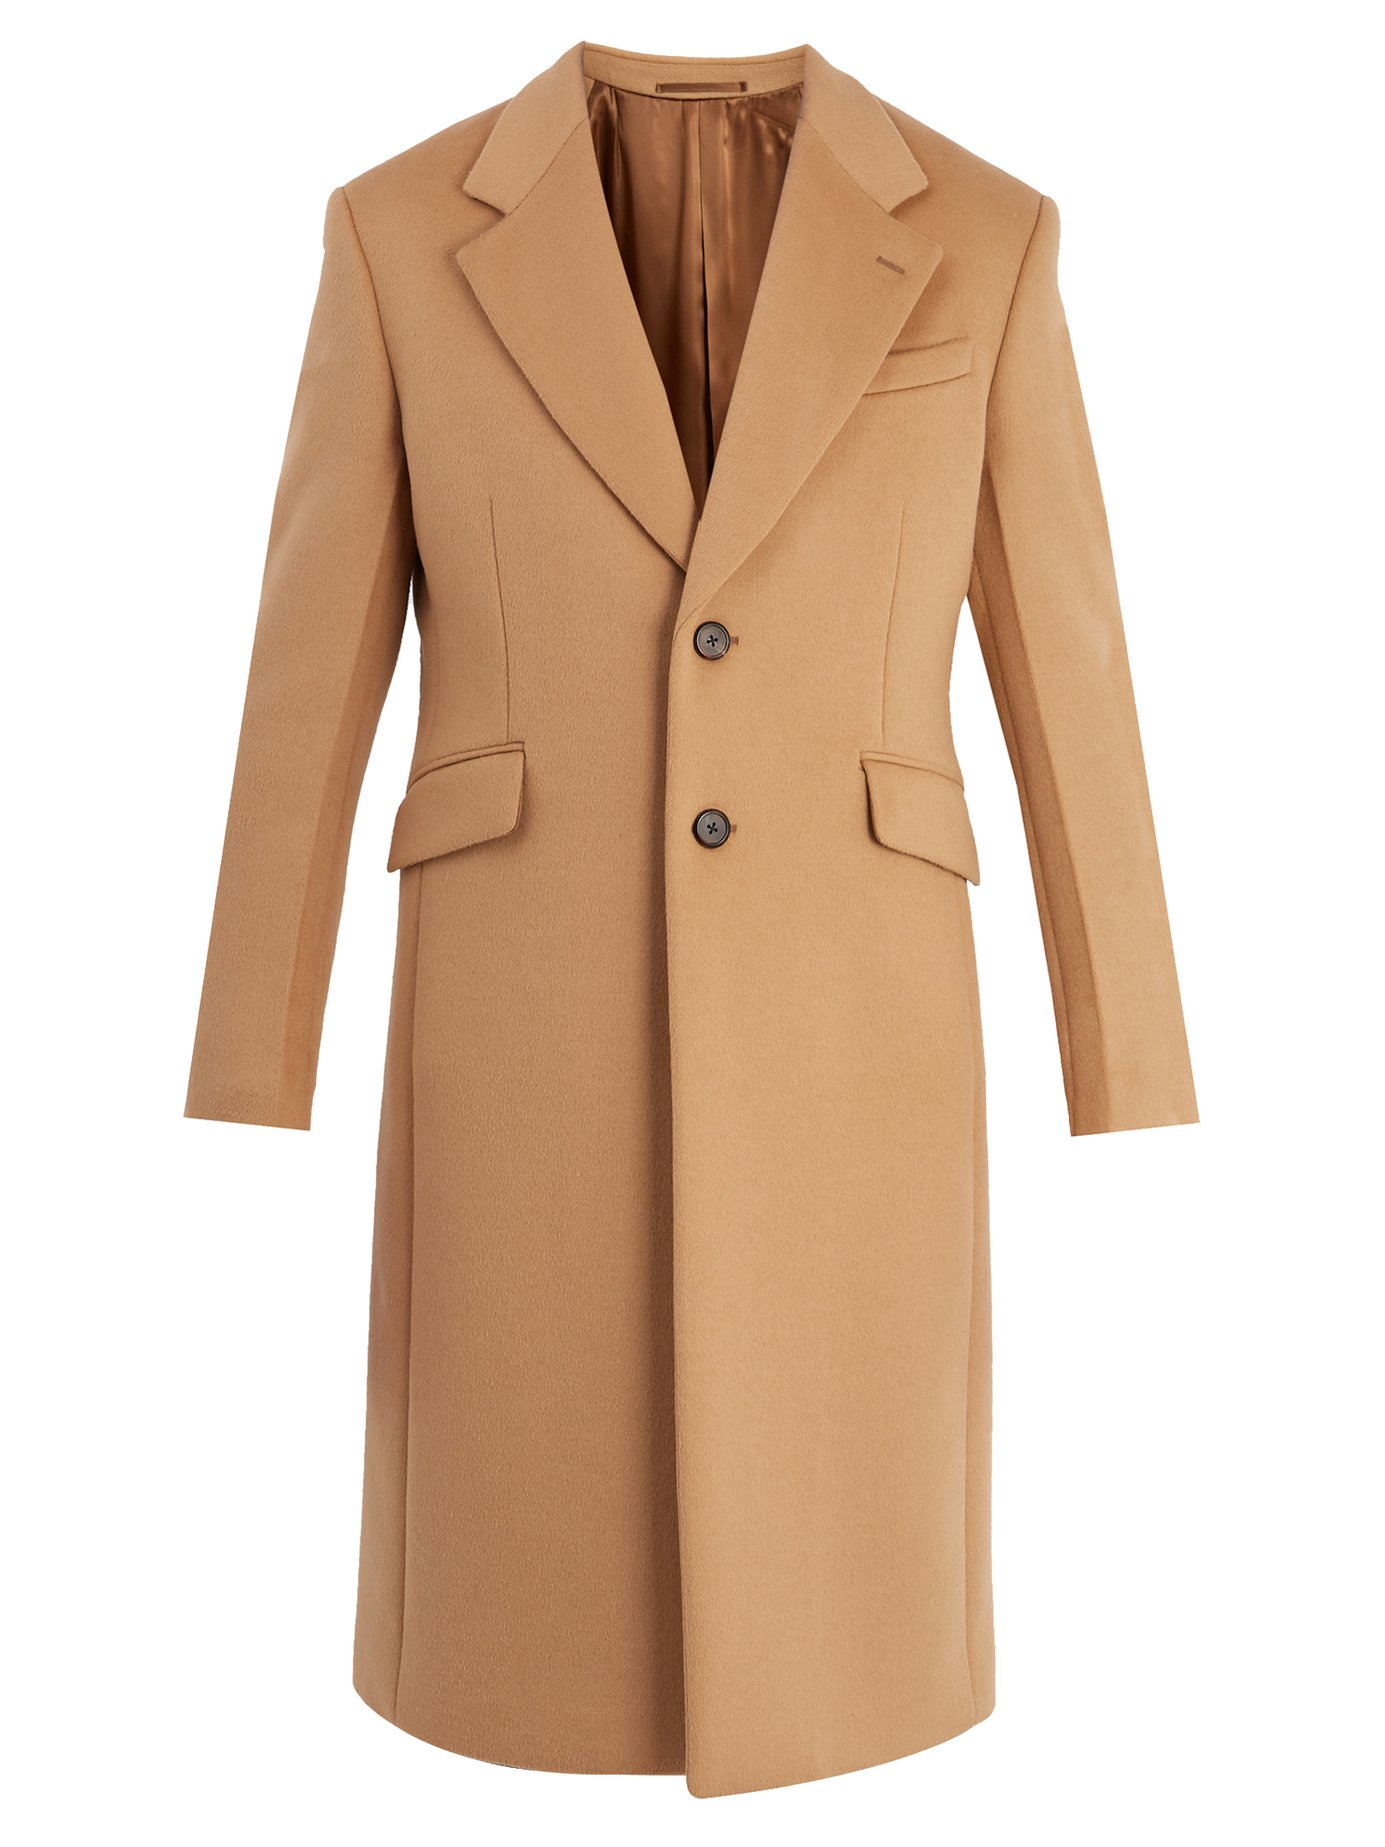 Prada overcoat at Matches Fashion - £3,060